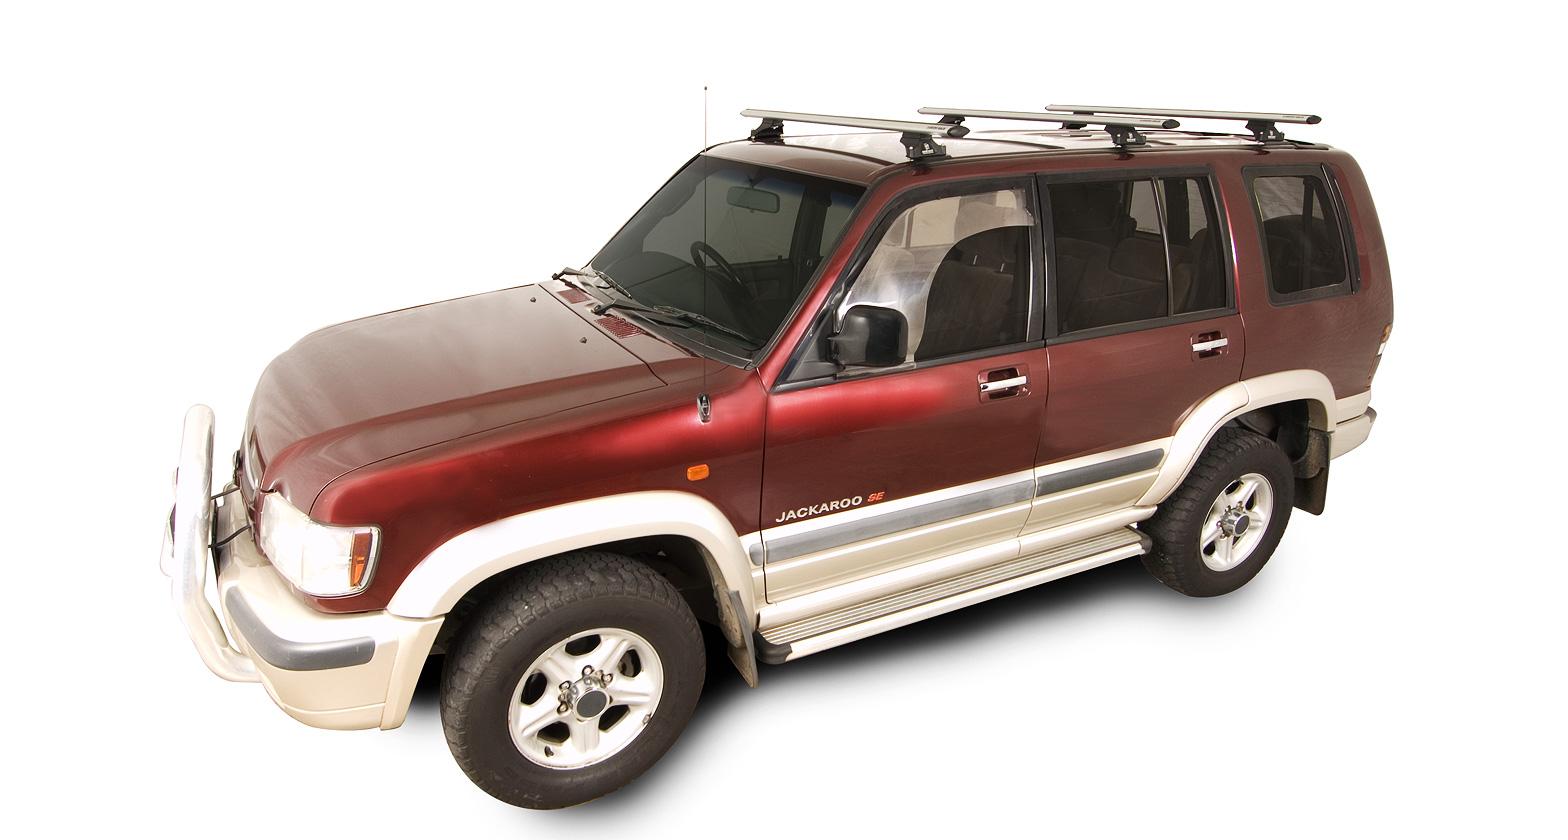 Holden Jackaroo 4dr 4wd Lwb 04 92 To 09 04 Rhino Rack Vortex Roof Racks 3 Bar Roof Rack World